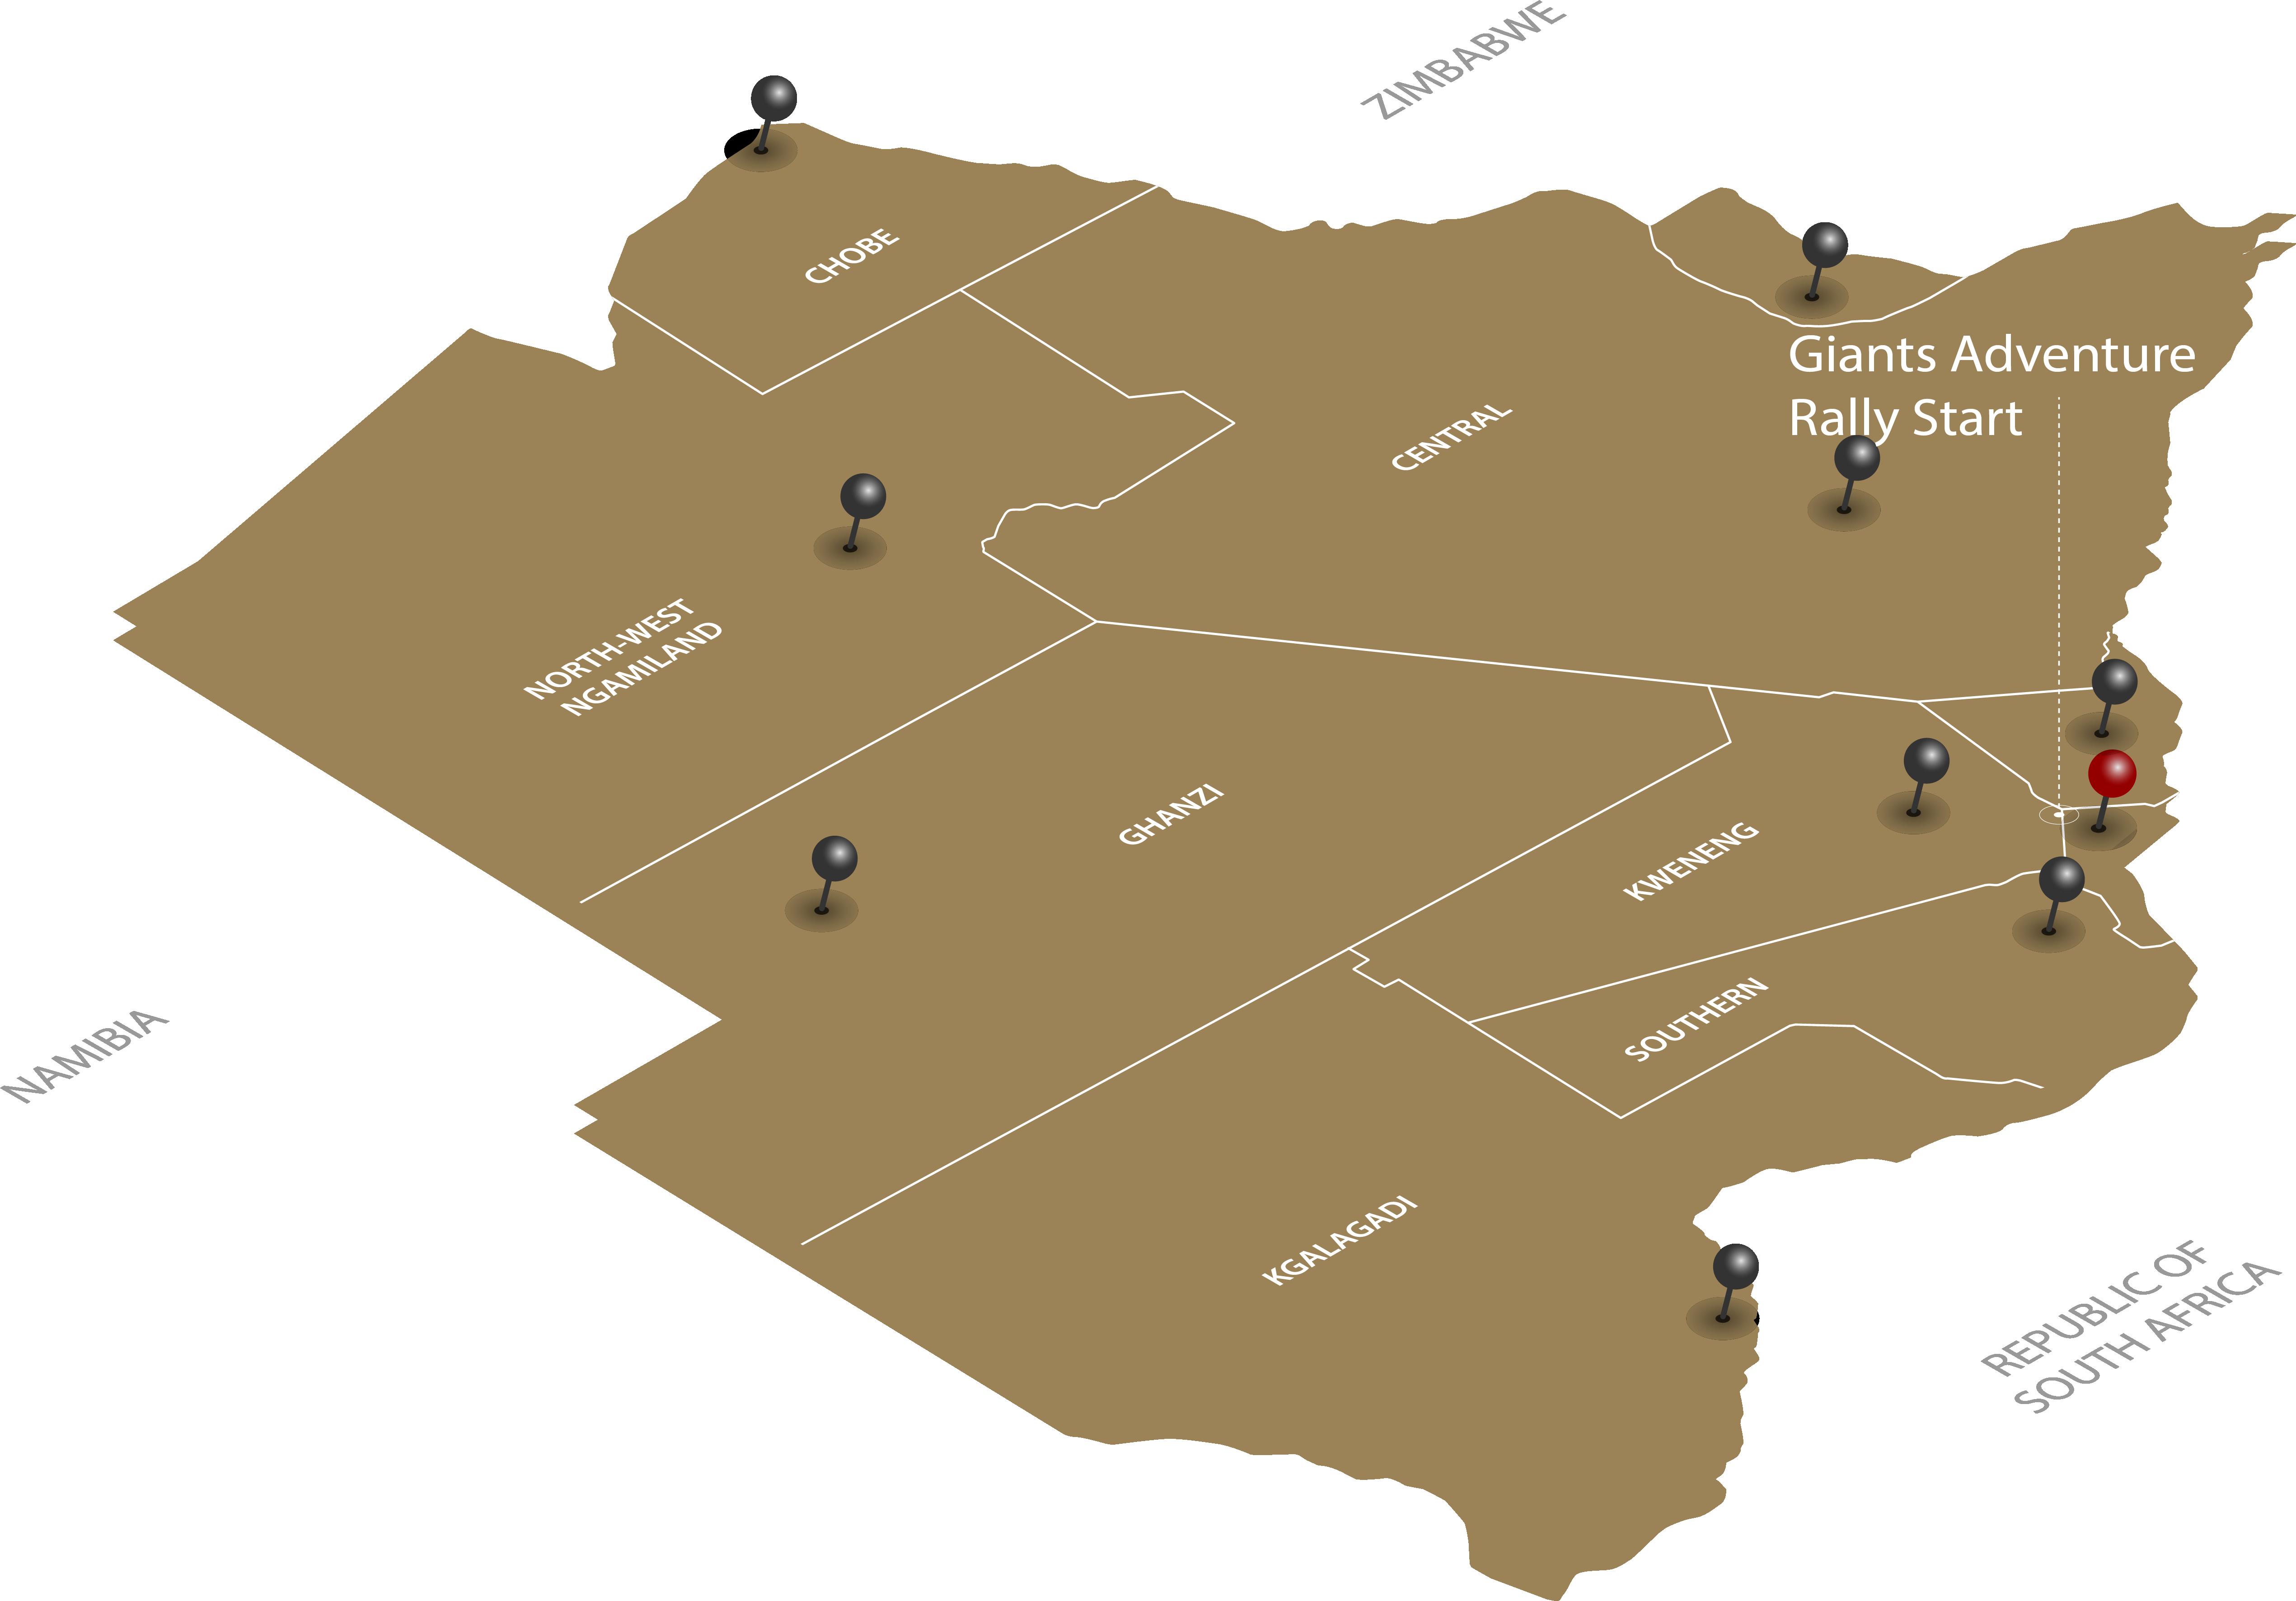 plains adventure rally map